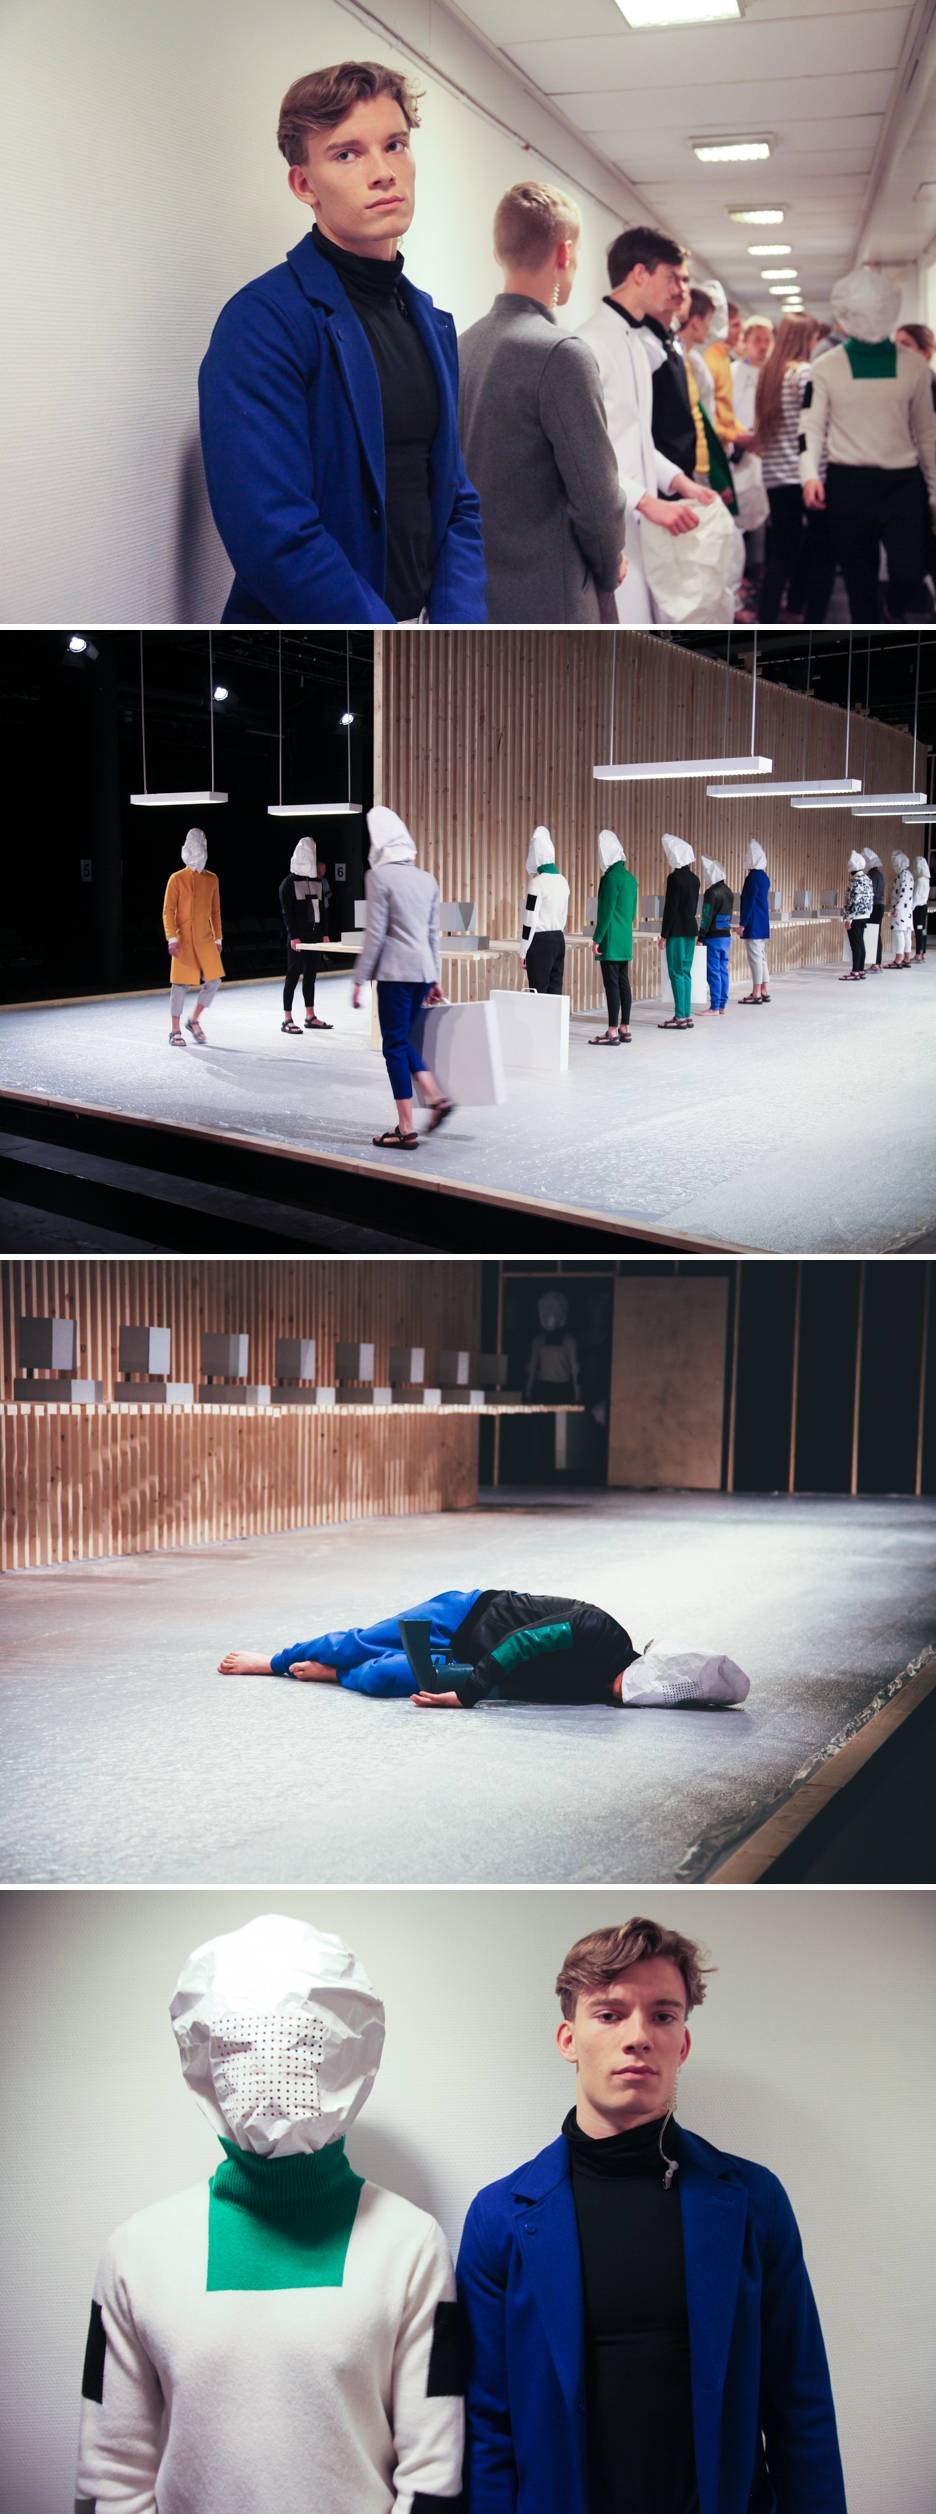 Han Kjobenhavn Show AW15 | Scandianvia Standard